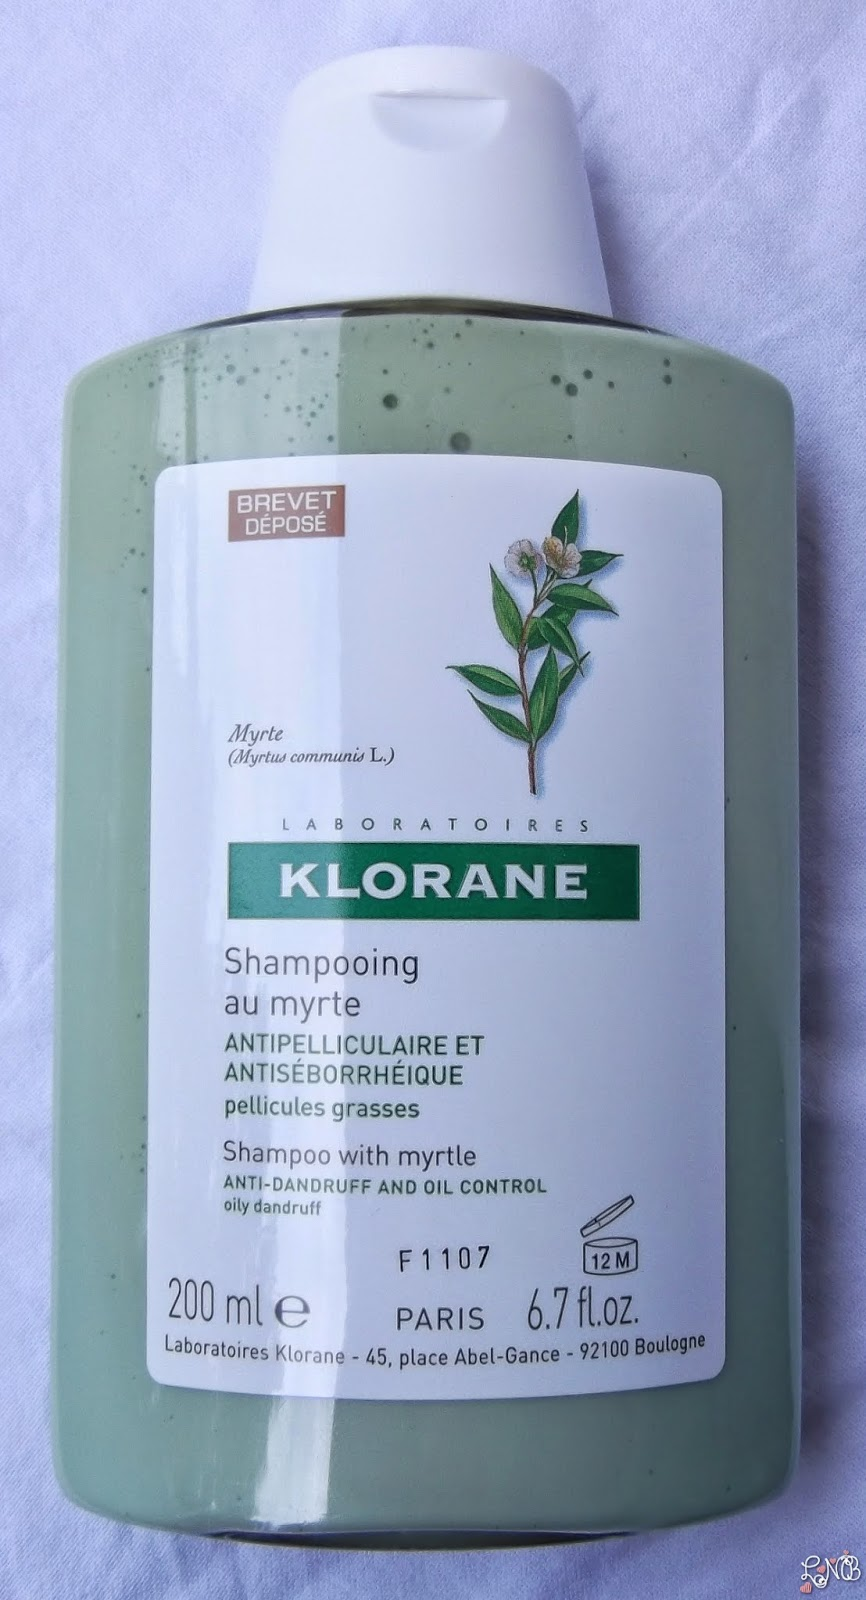 KLORANE Shampooing Antipelliculaire Antiséborrhéique Myrte